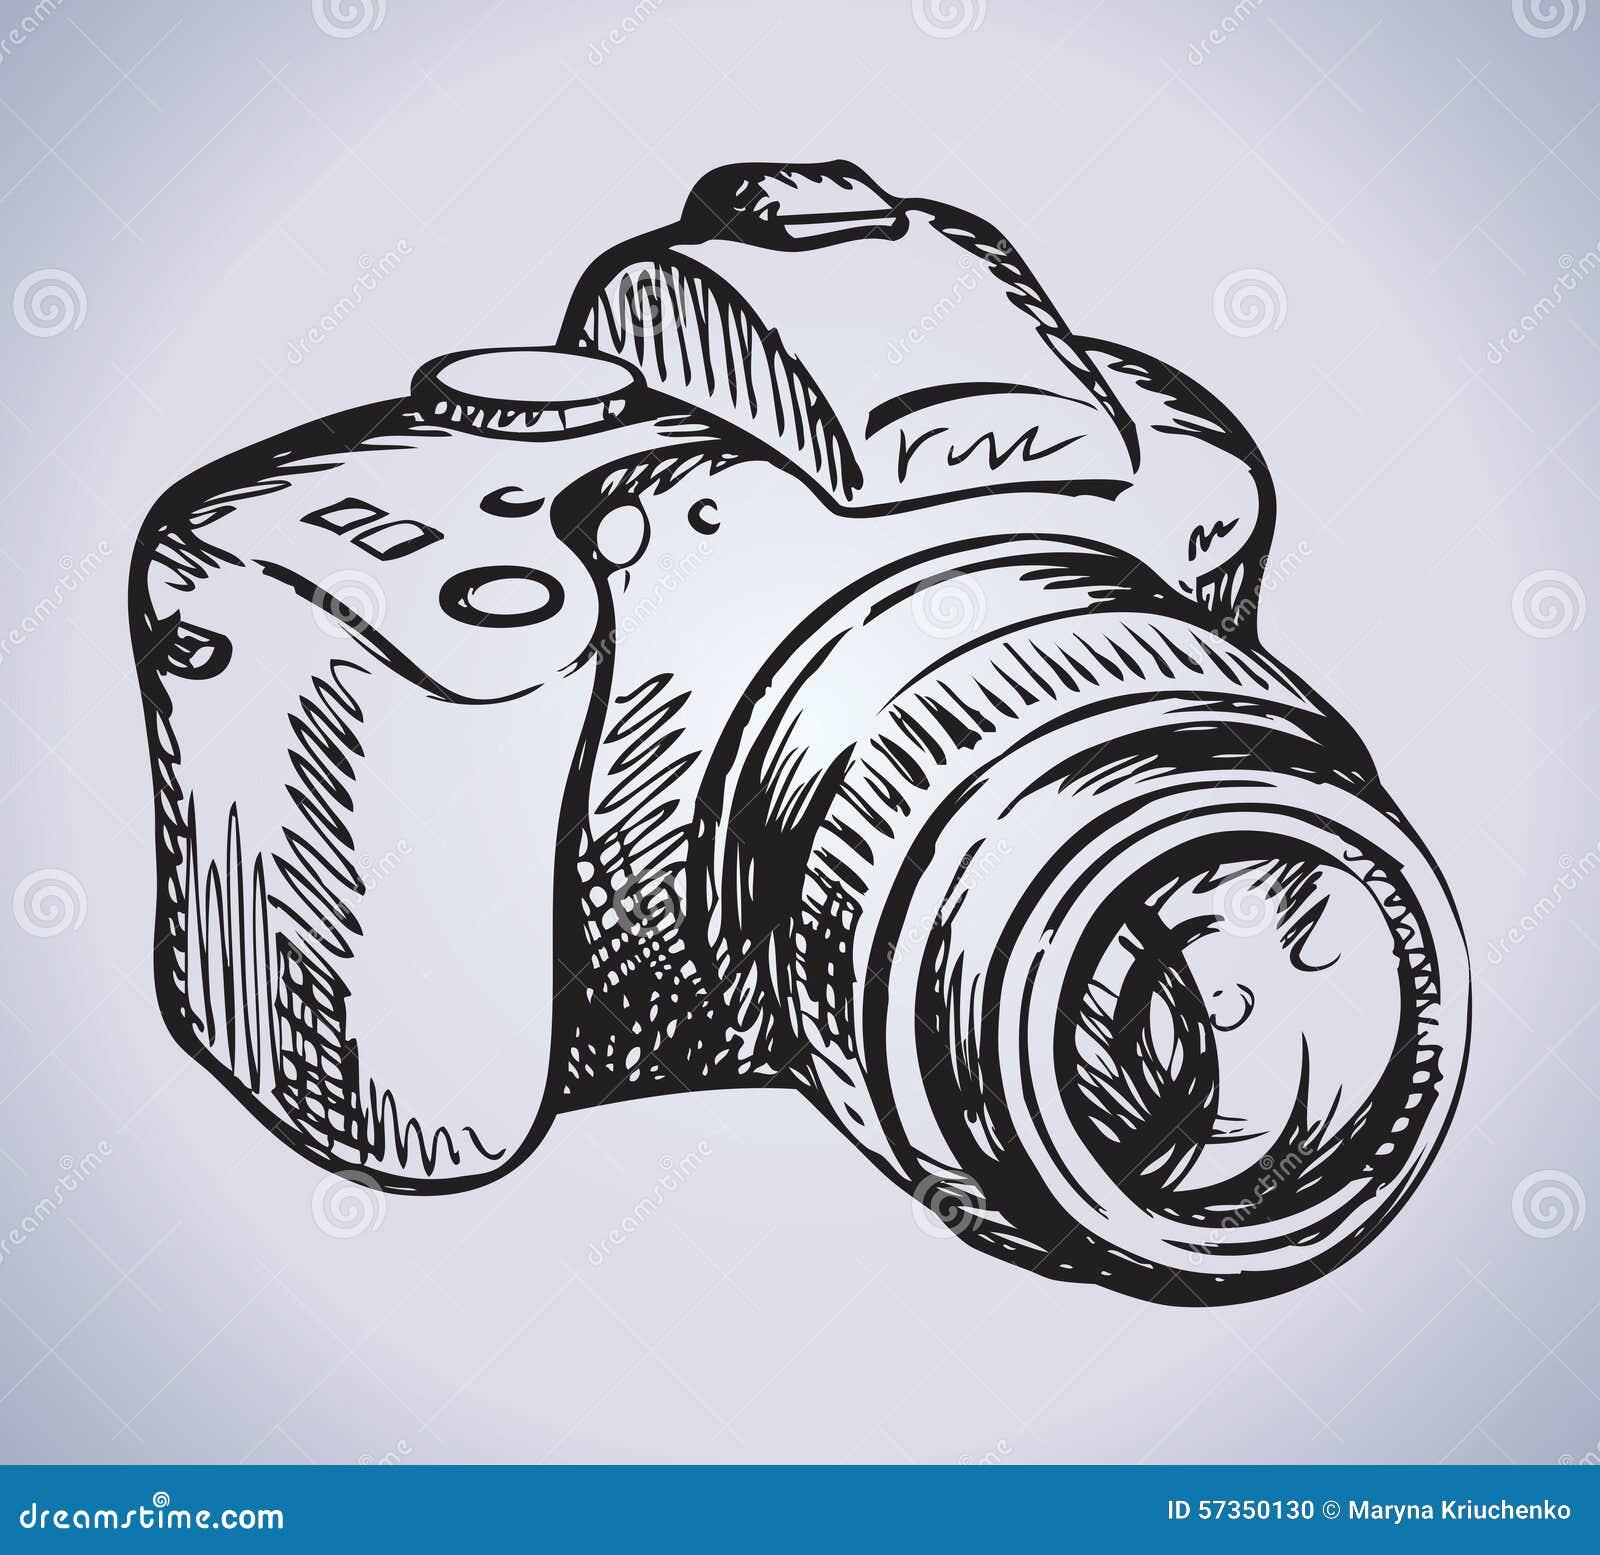 Camera Vector Drawing Stock Vector Image 57350130